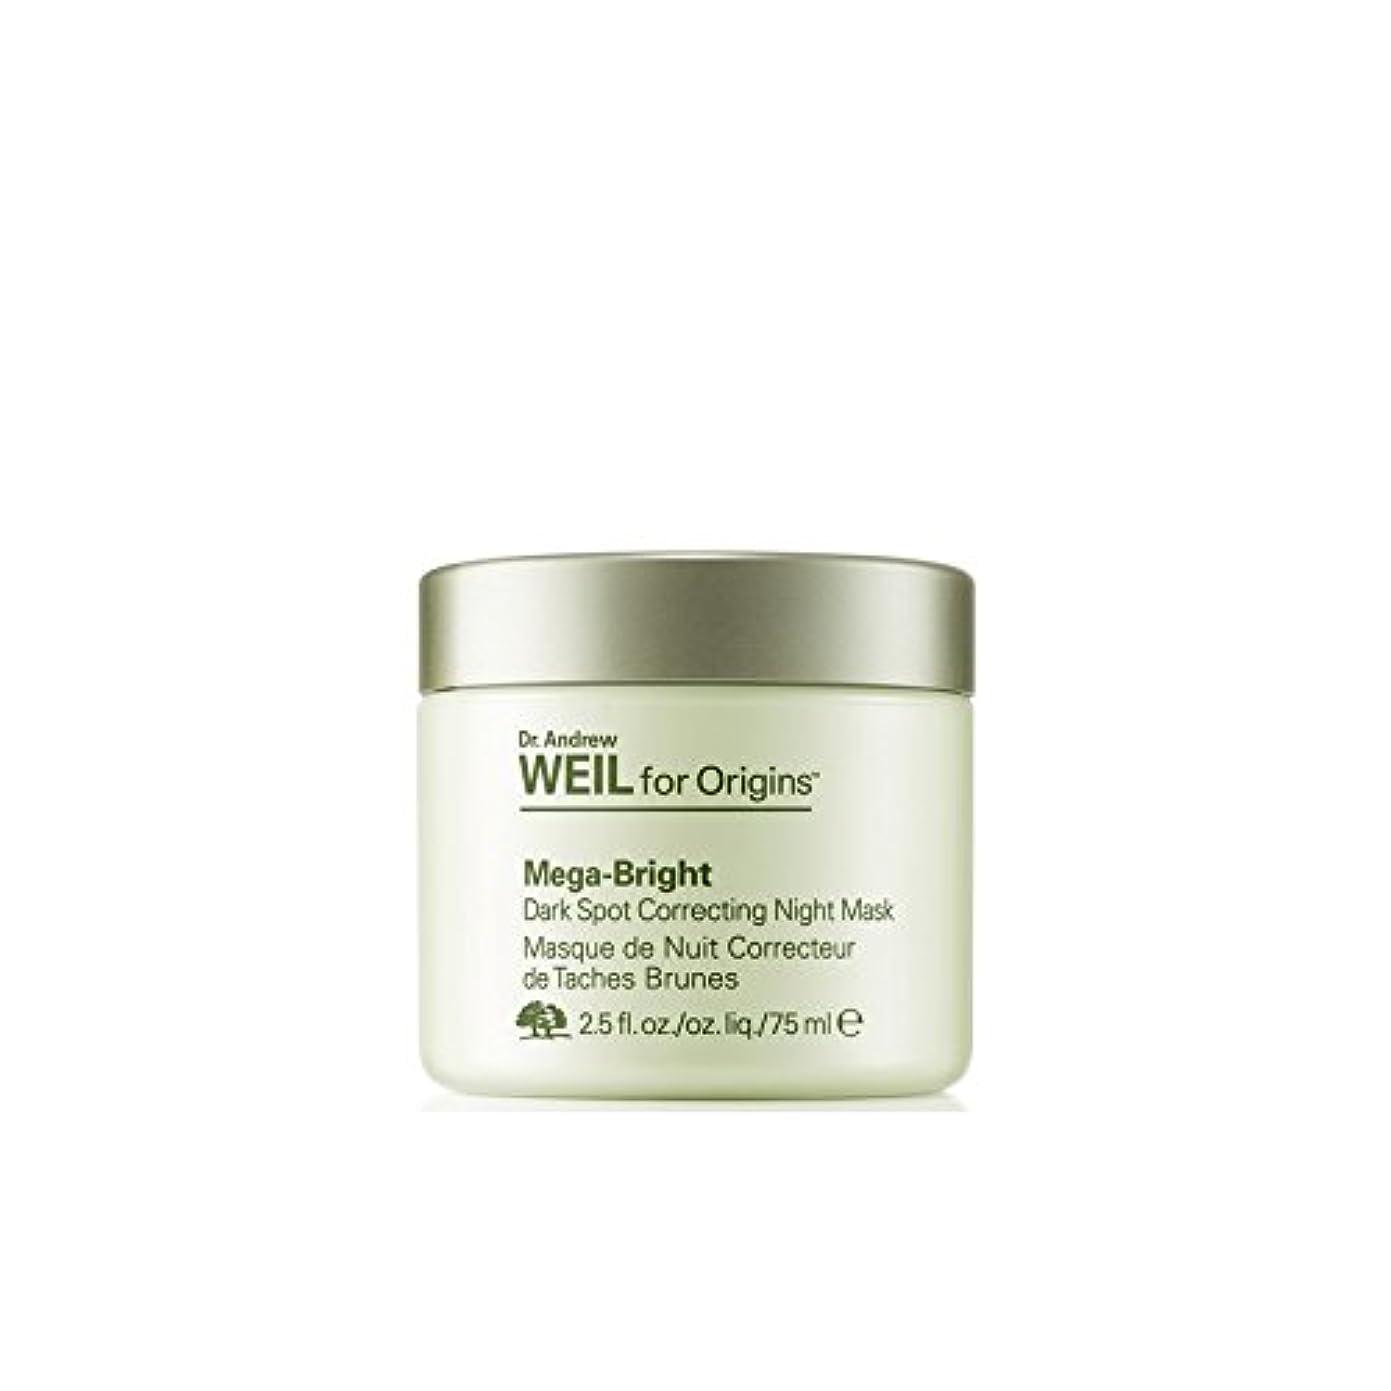 Origins Dr. Andrew Weil For Origins? Mega-Bright Skin Tone Correcting Overnight Mask 75ml (Pack of 6) - 起源アンドルー?ワイル...